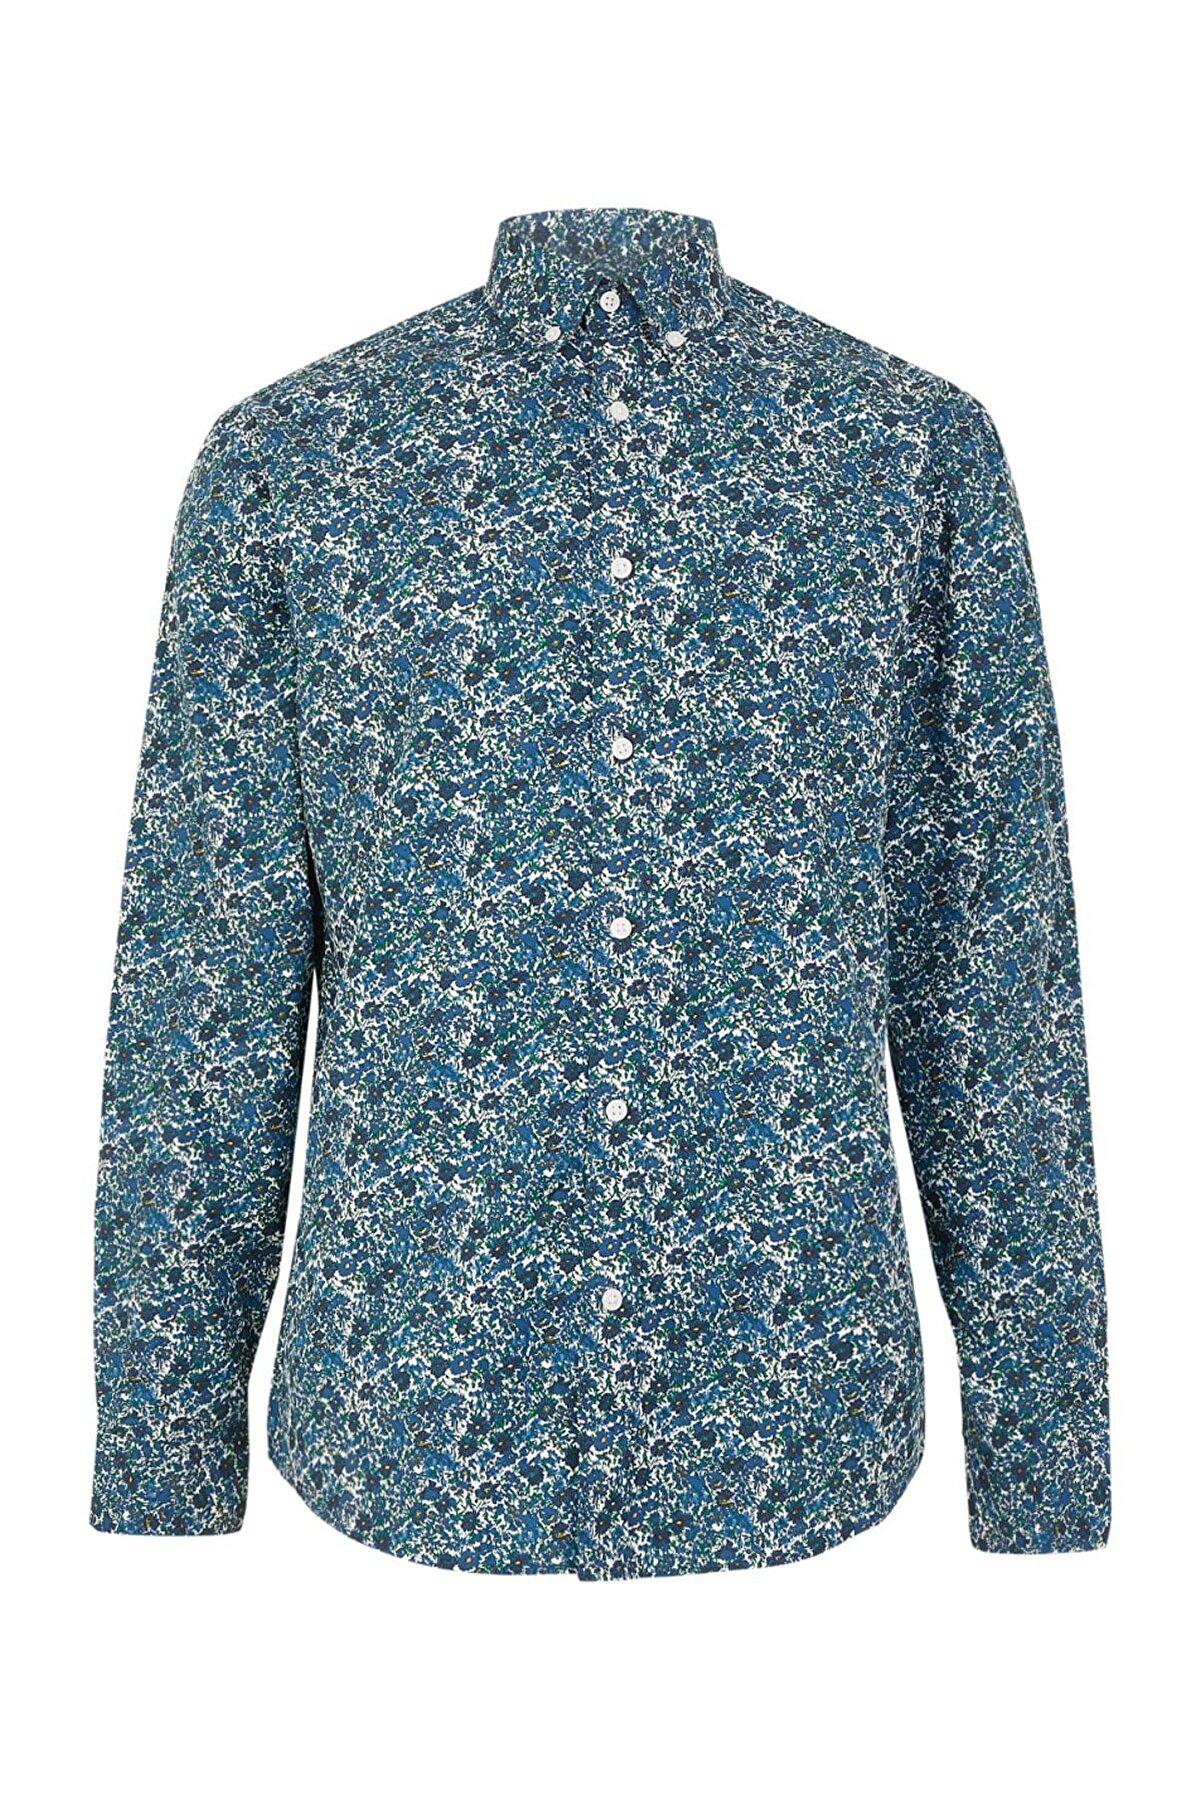 Marks & Spencer Erkek Blue Mix Pamuklu Çiçek Desenli Relaxed Gömlek T25002882M